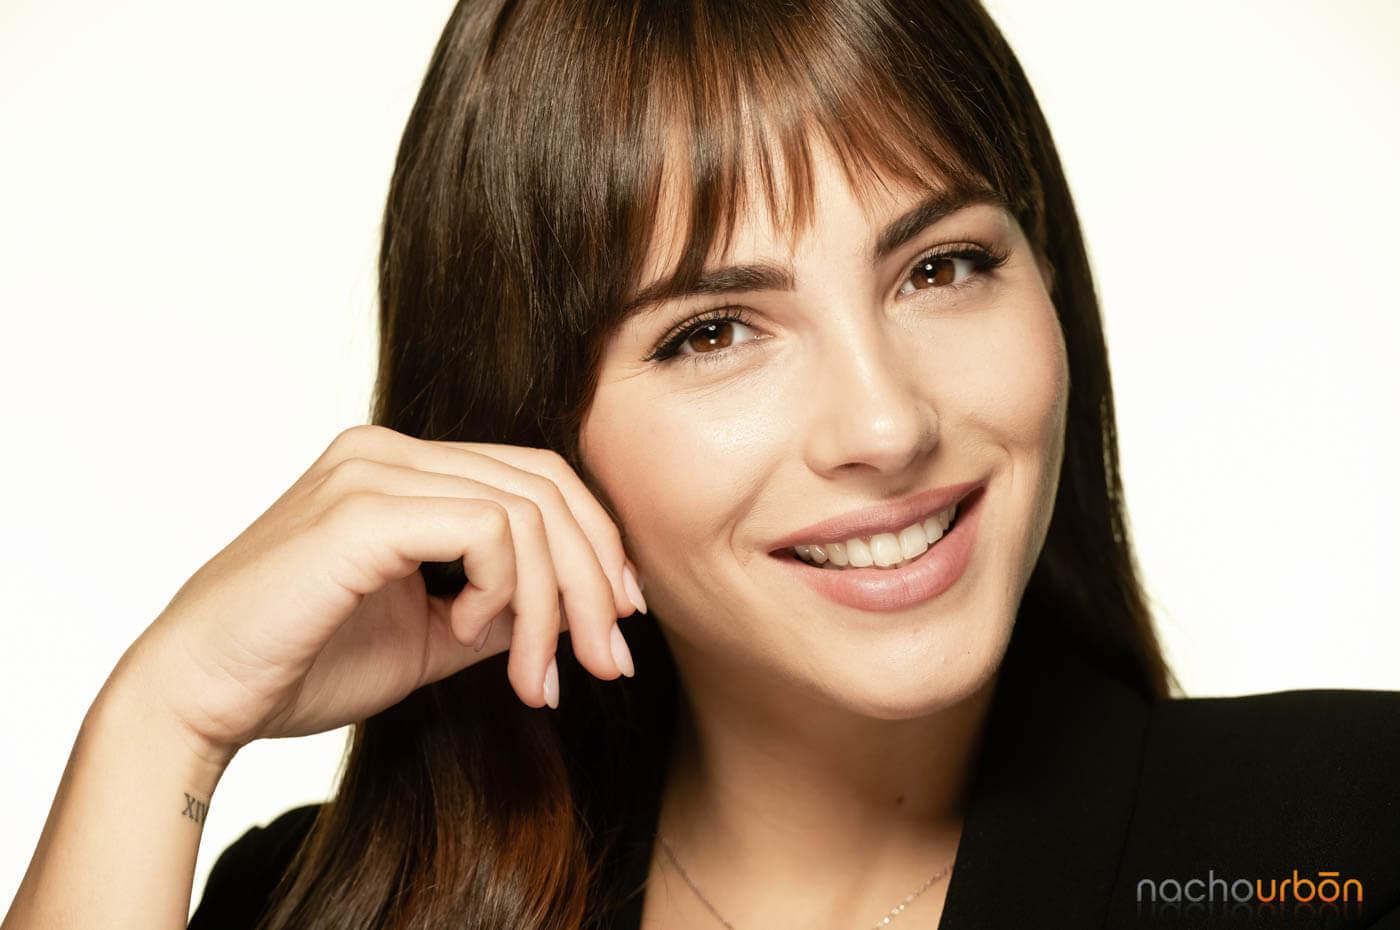 fotografo-belleza-mujer-especialista-beauty-nacho_urbon-